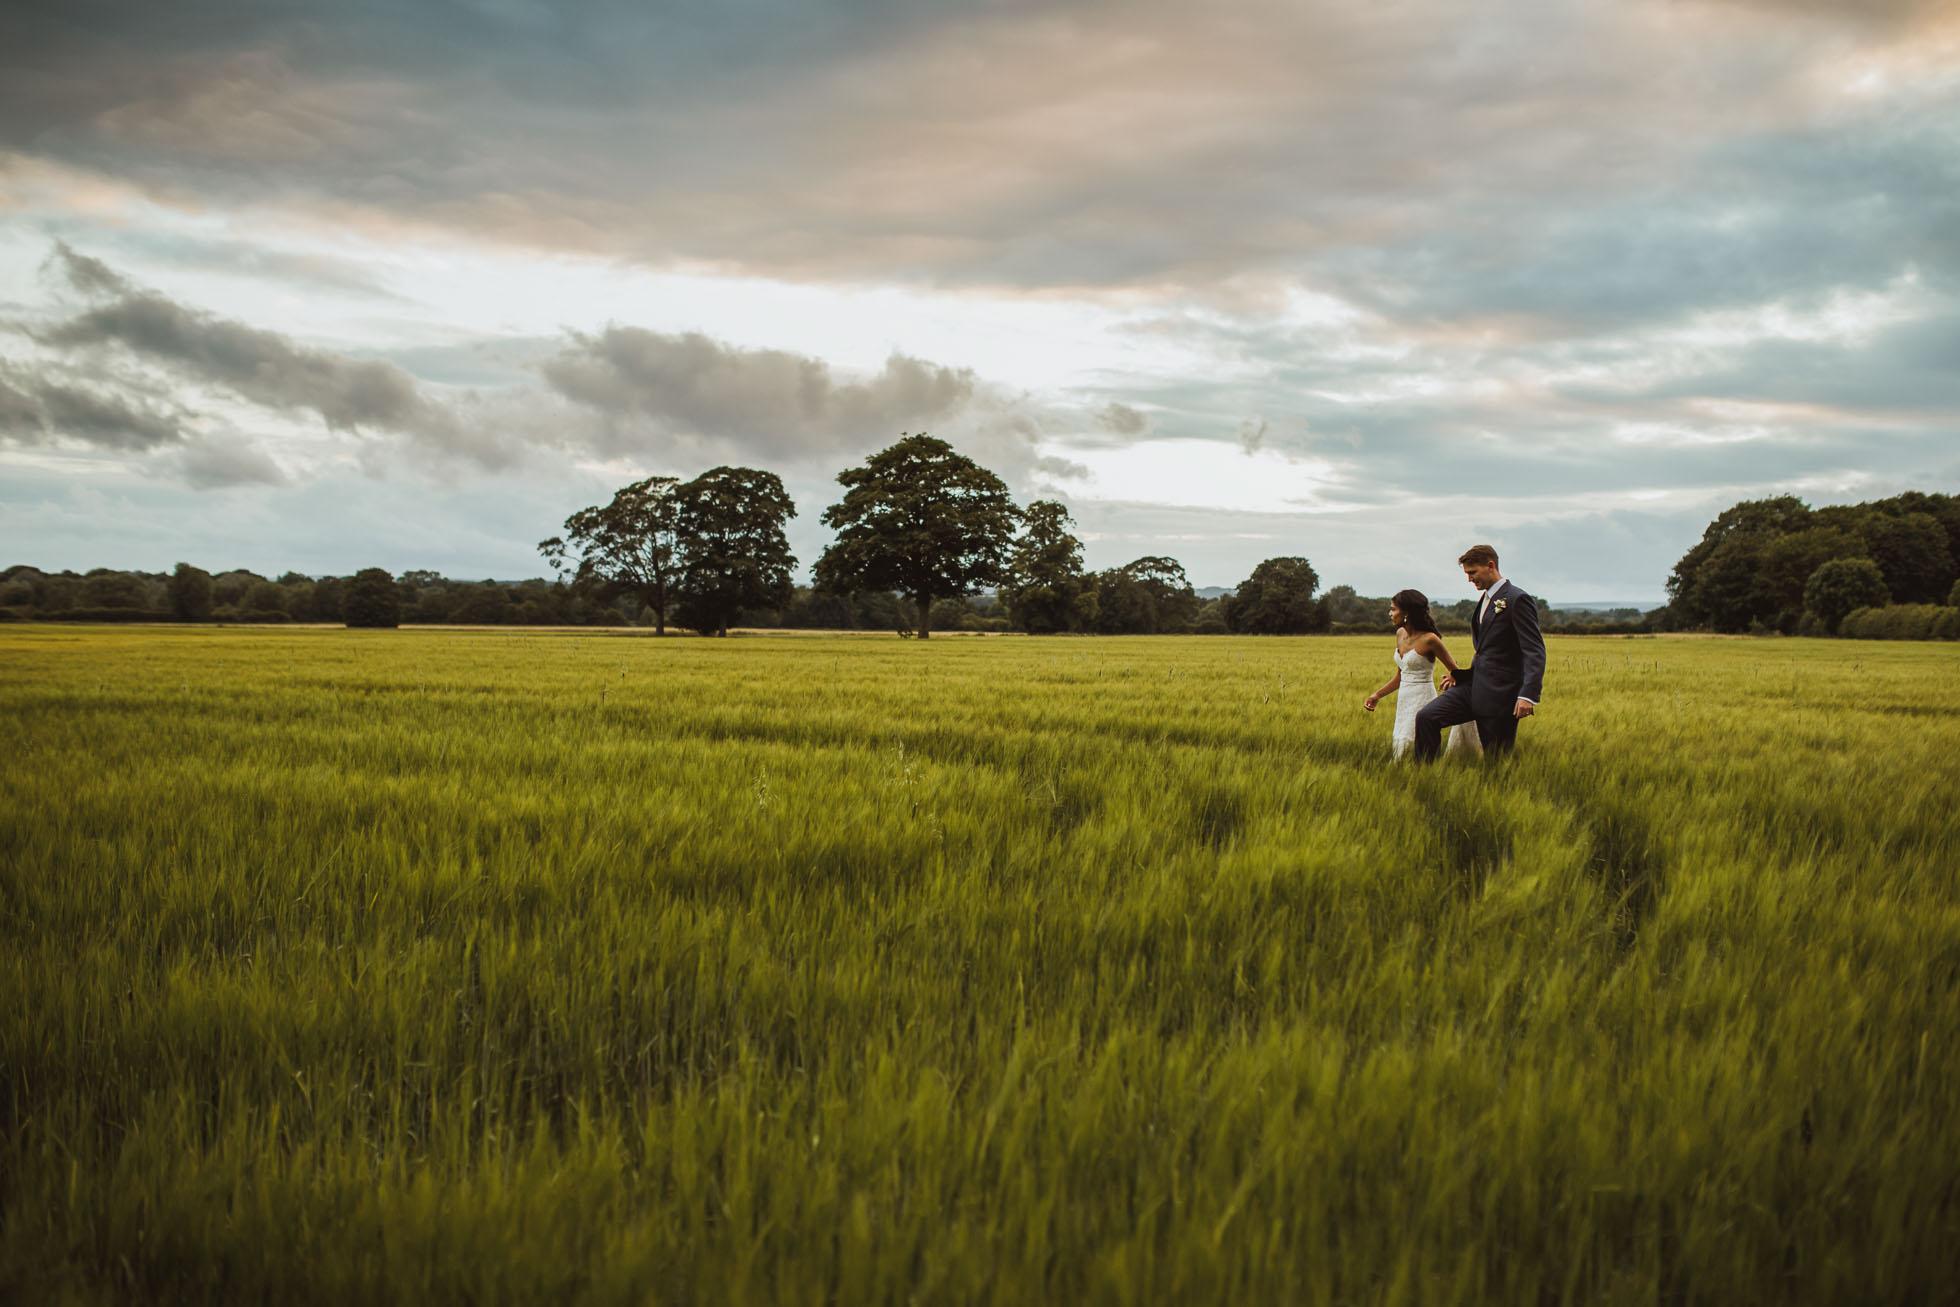 norton_conyers_wedding_photographer-85.jpg